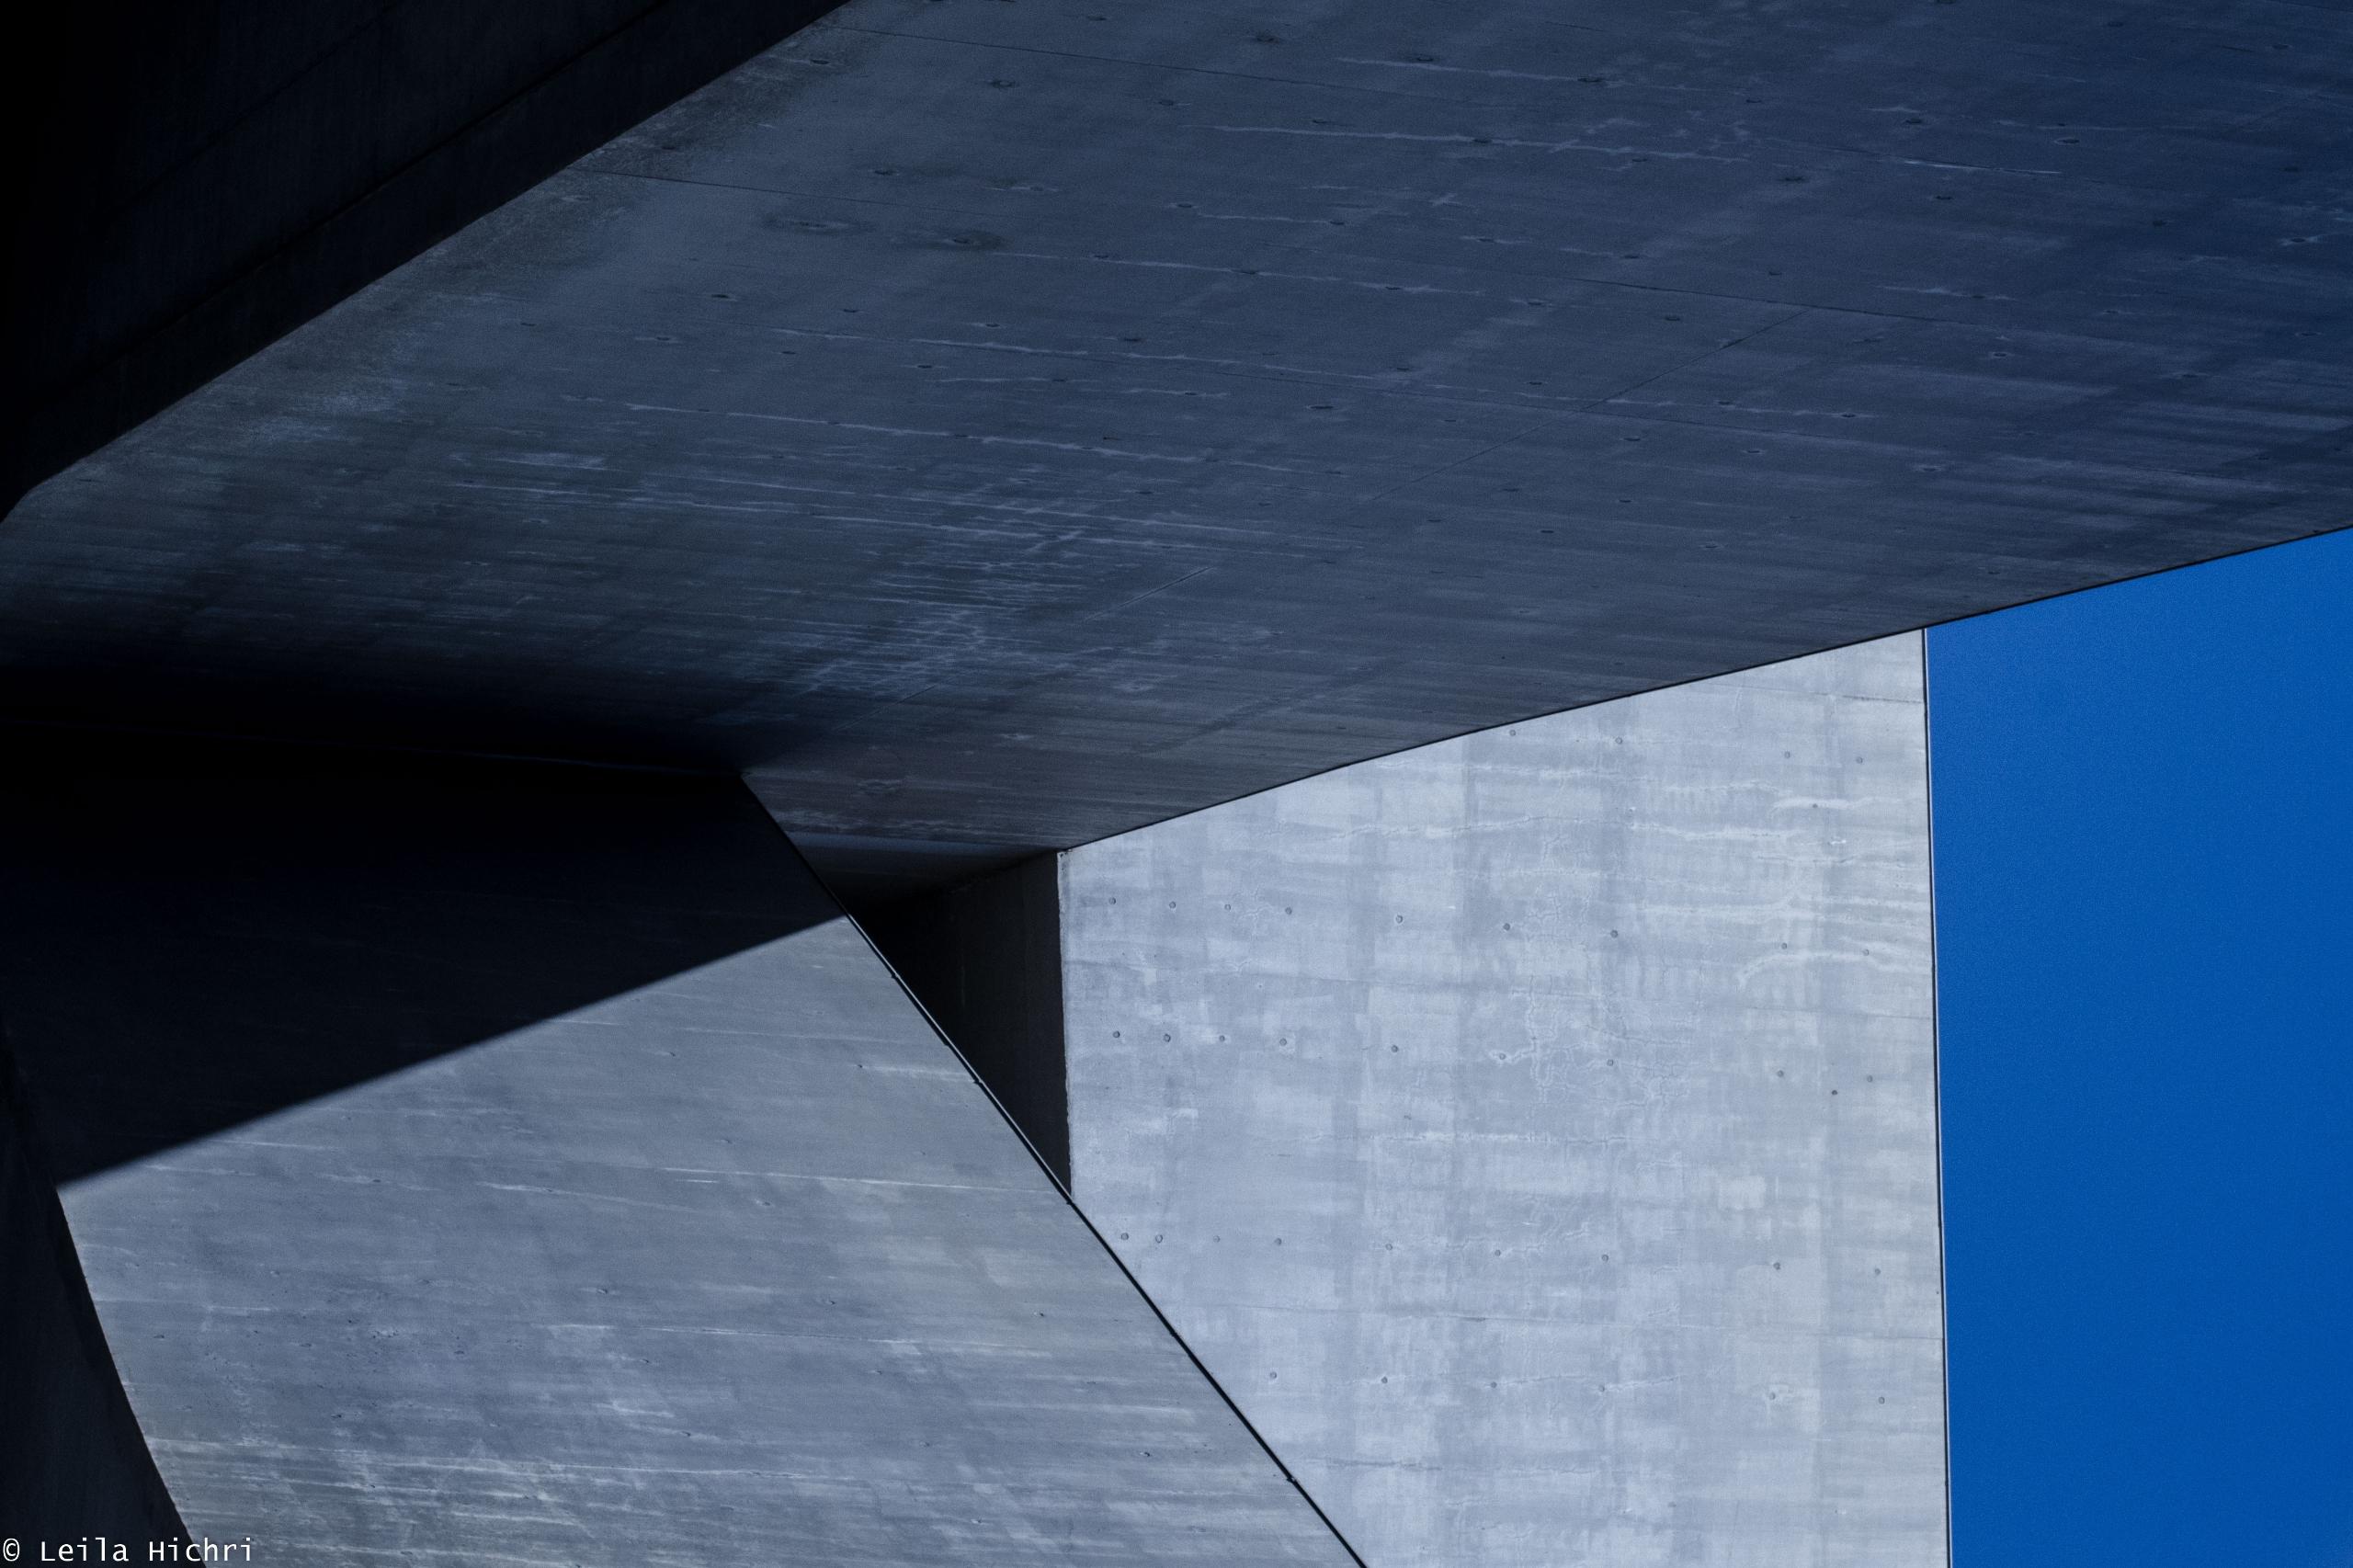 shapes, architecture, shadows - trollina14 | ello